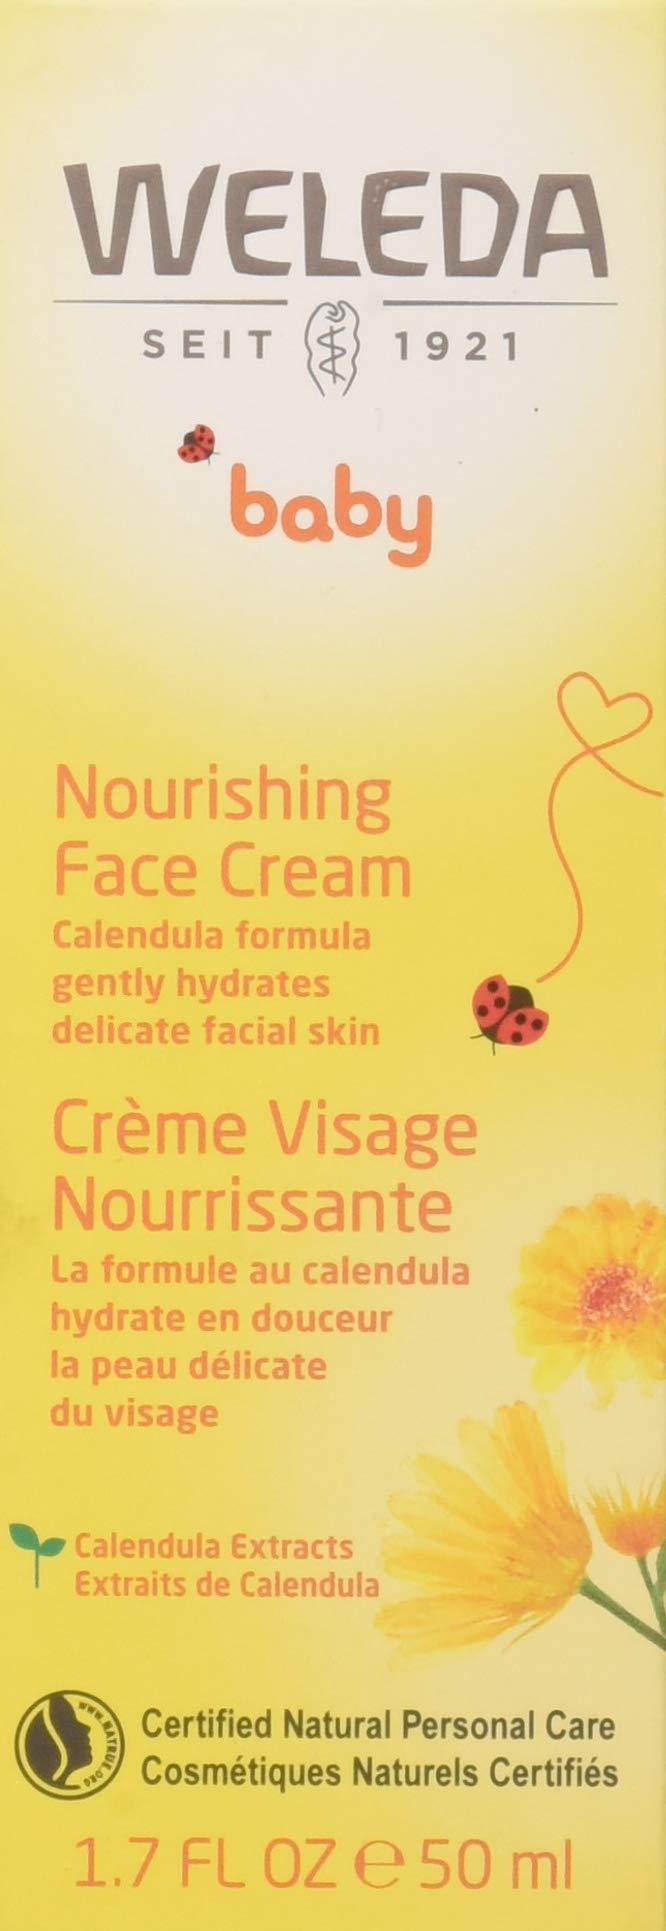 Weleda 9661 - Crema diurna facial (piel sensible) product image